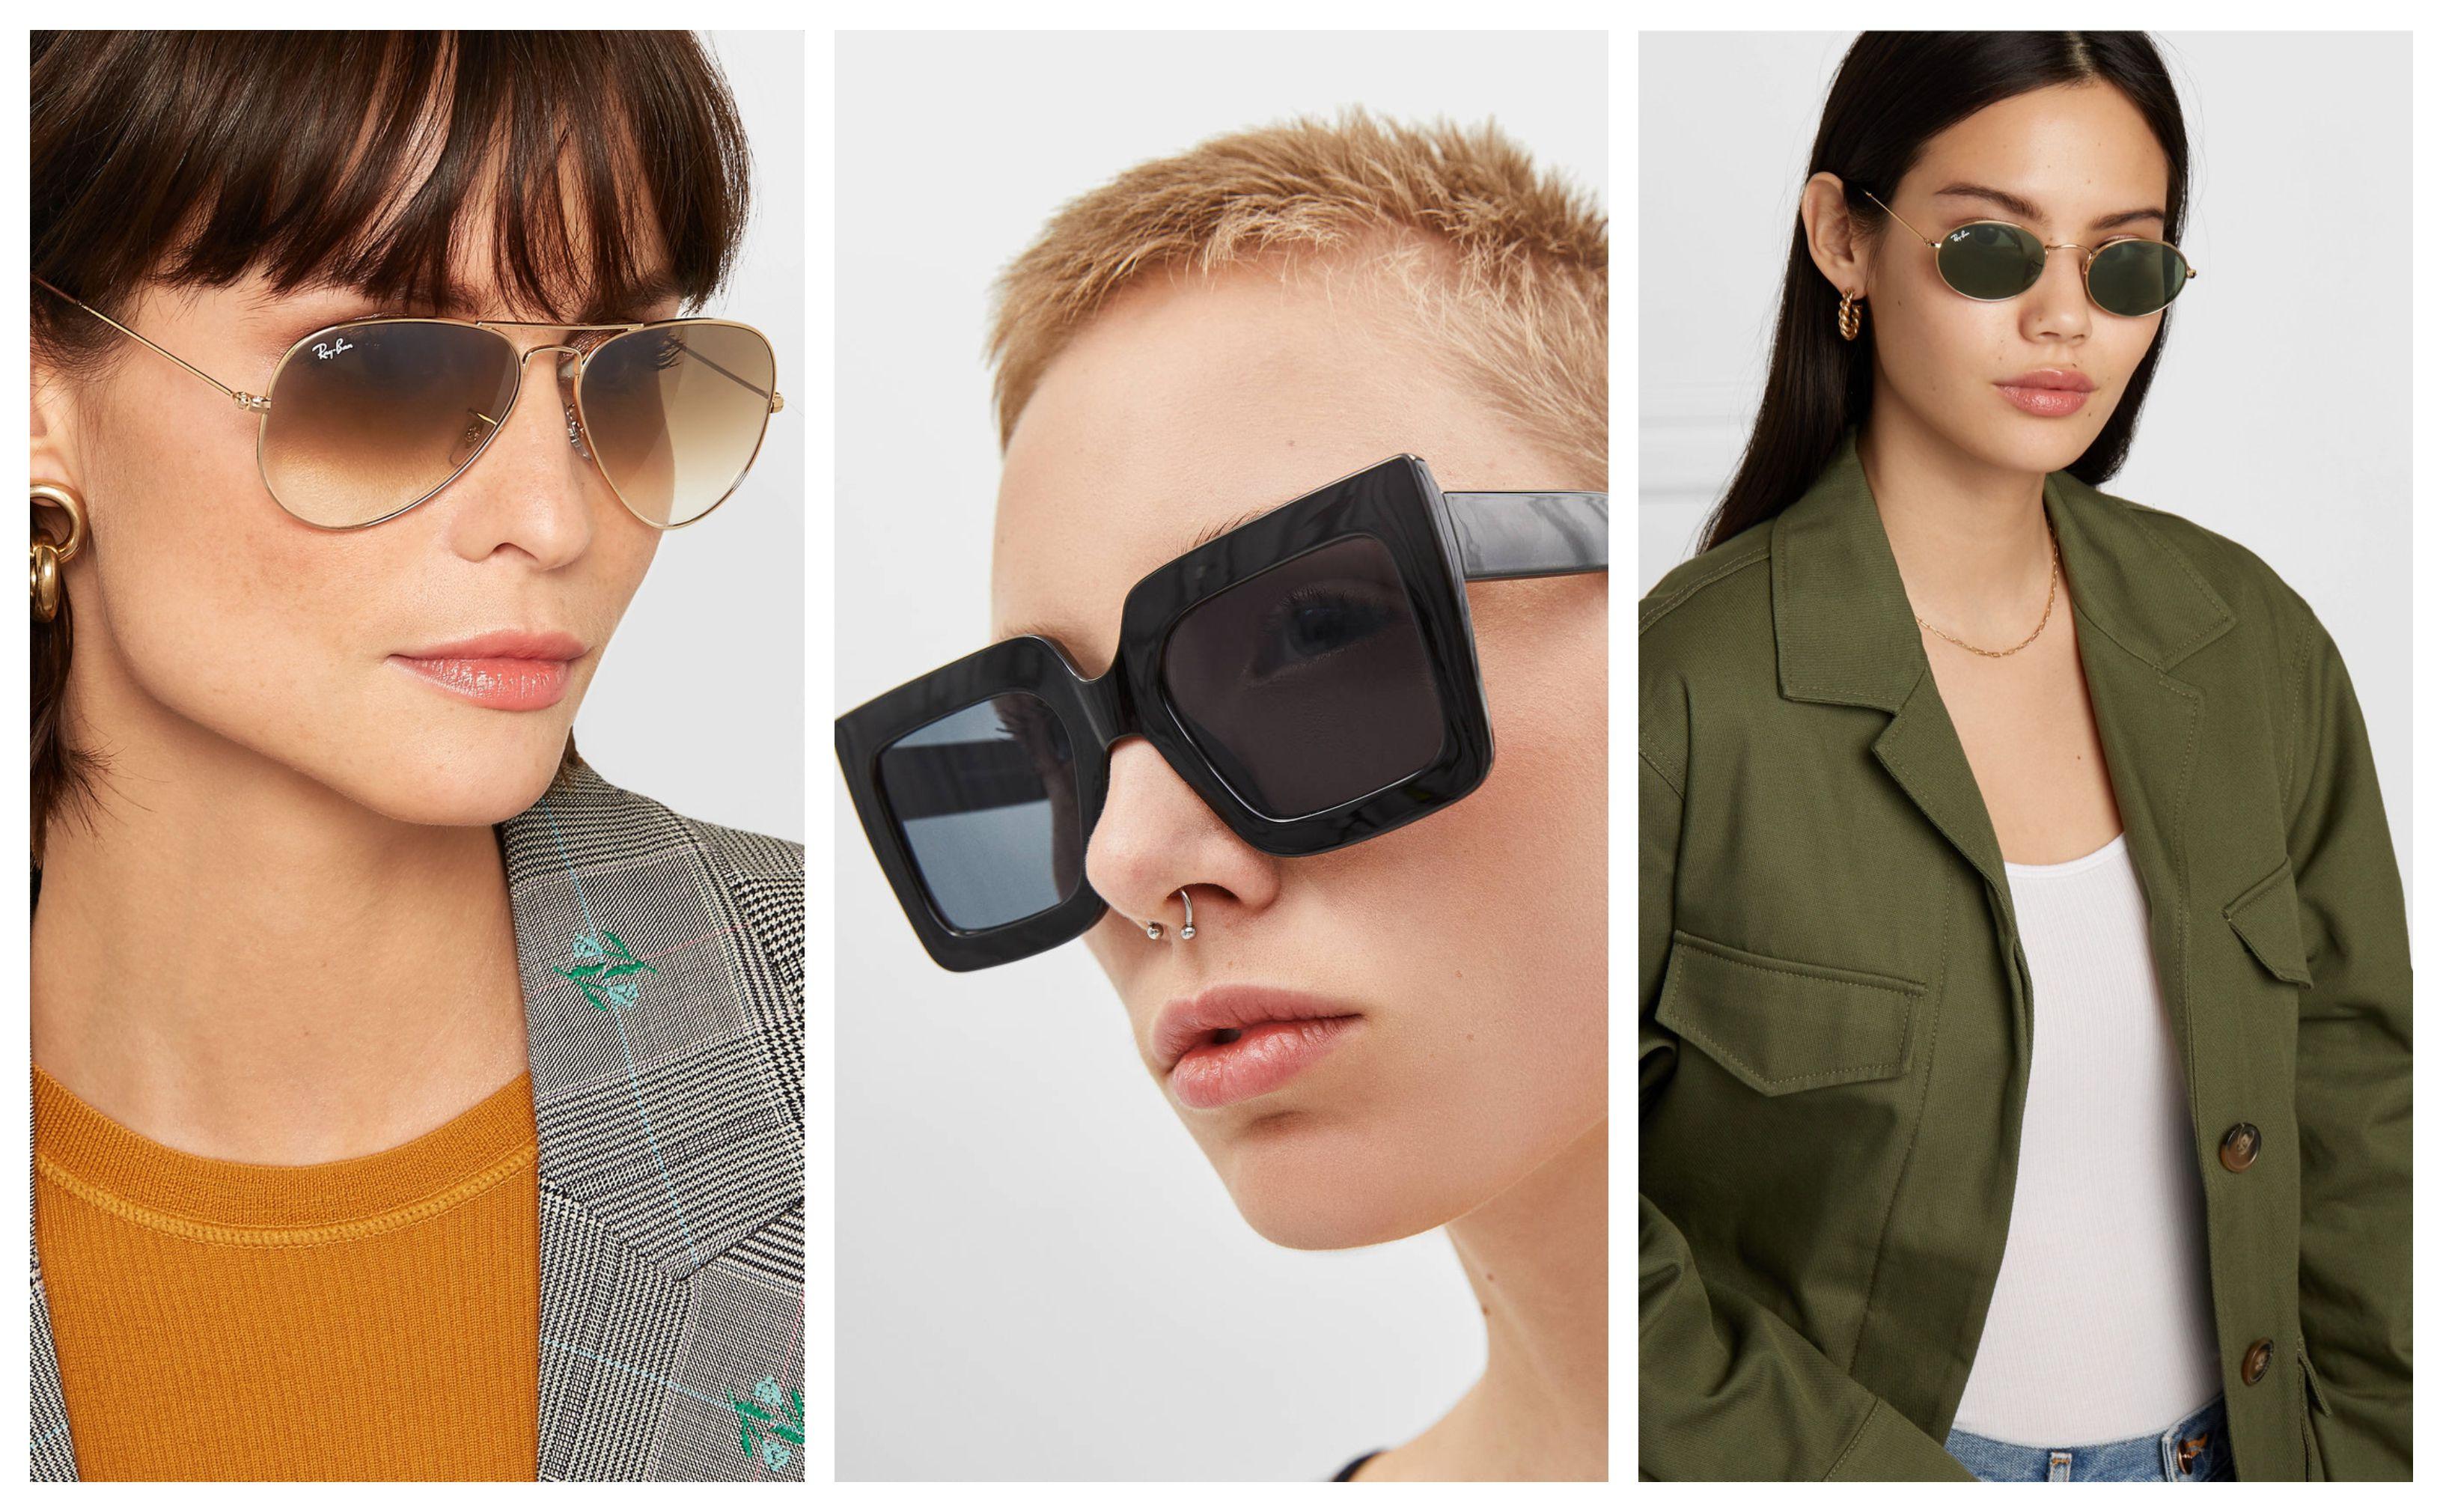 Izabrali smo sunčane naočale za svaki tip lica: Kako pronaći prave za sebe?